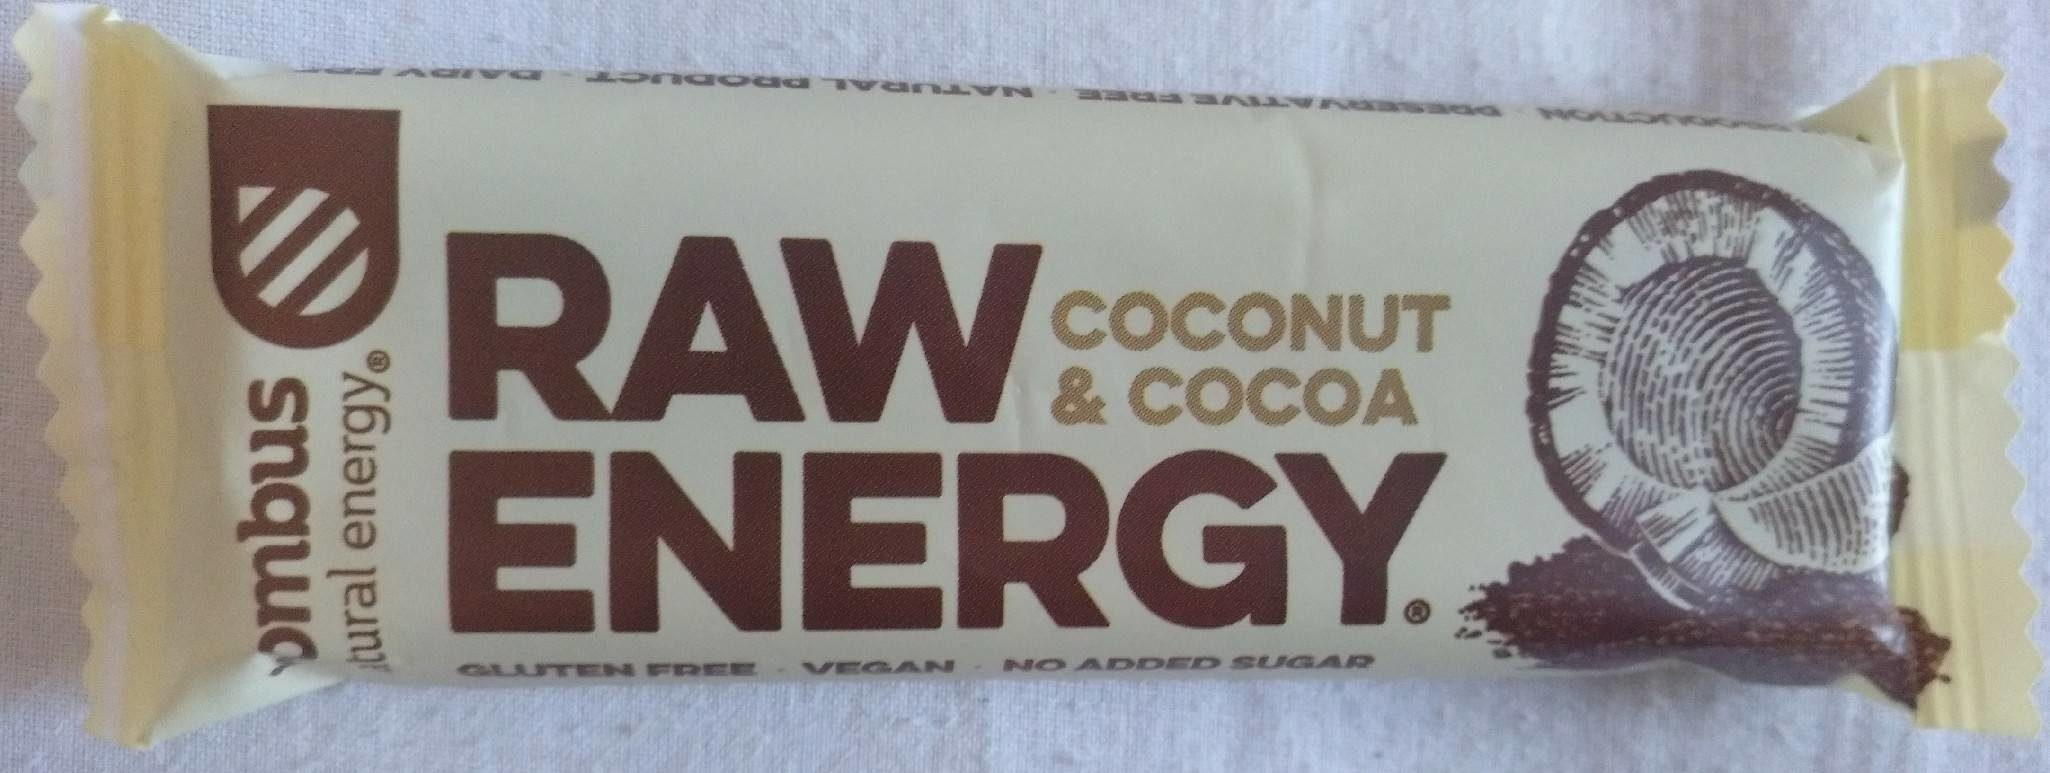 Raw Energy Coconut & Cocoa - Produit - fr